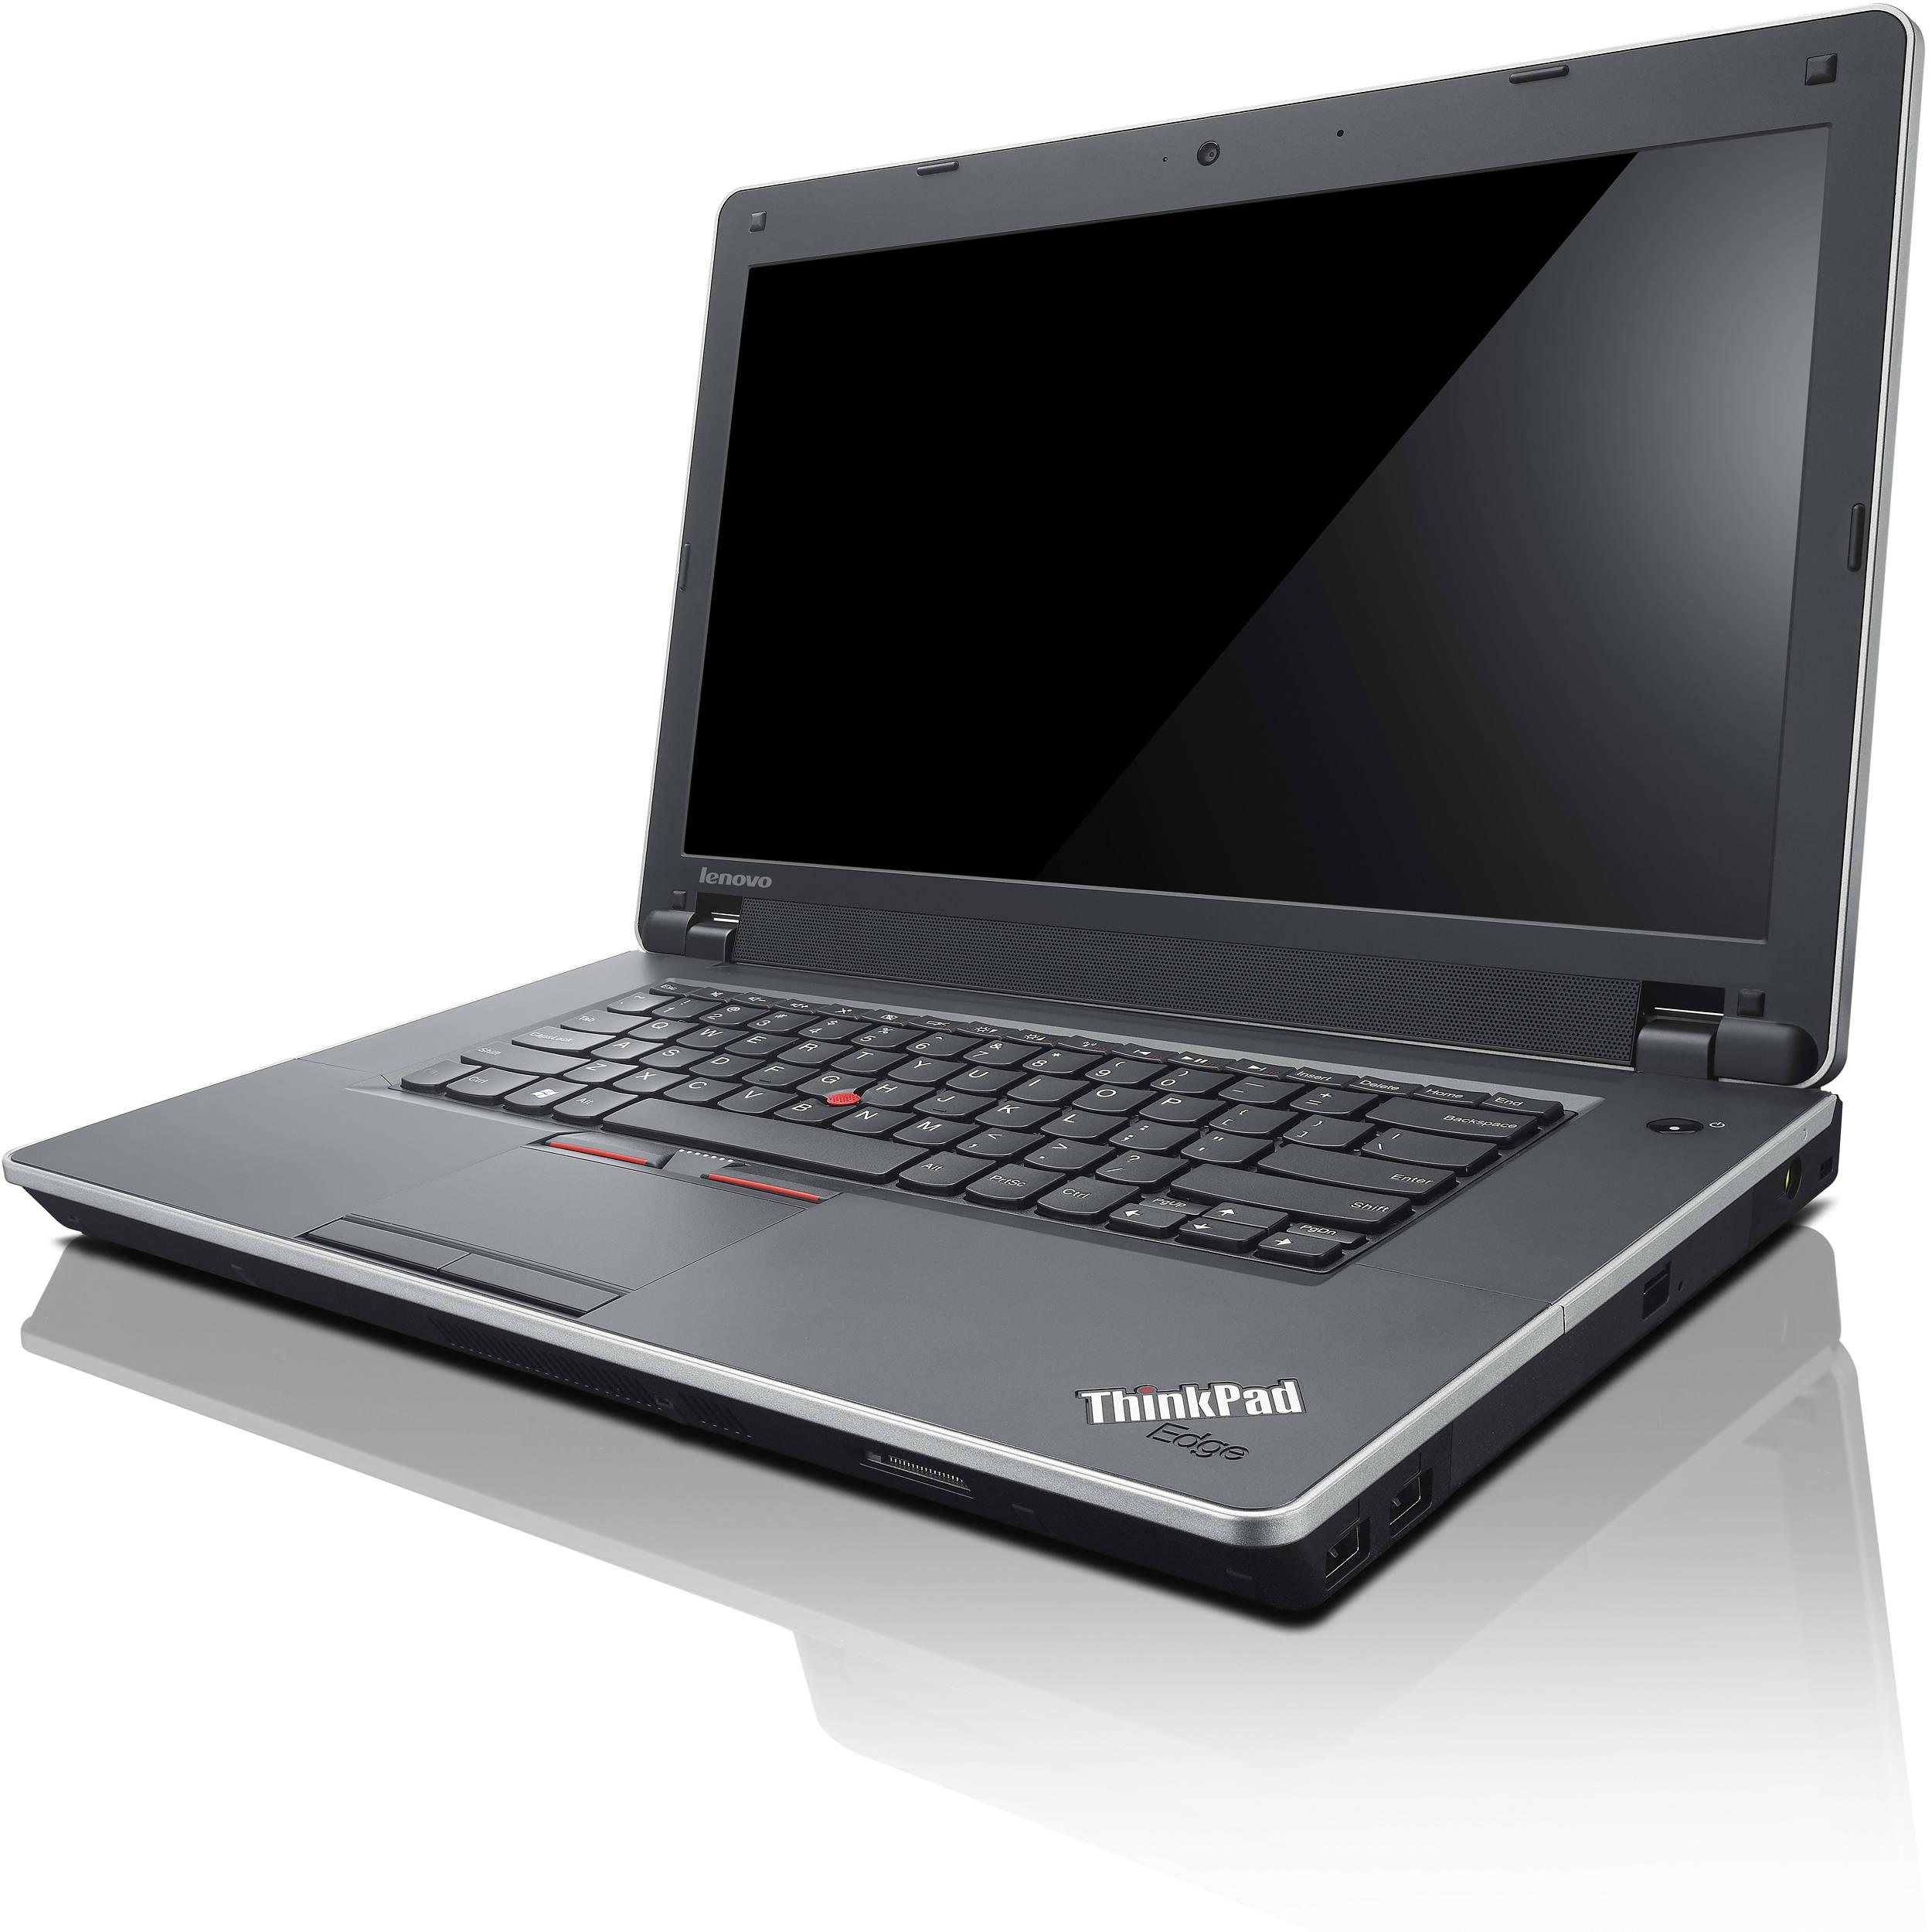 Lenovo Edge 15 Configuration Related Keywords & Suggestions - Lenovo